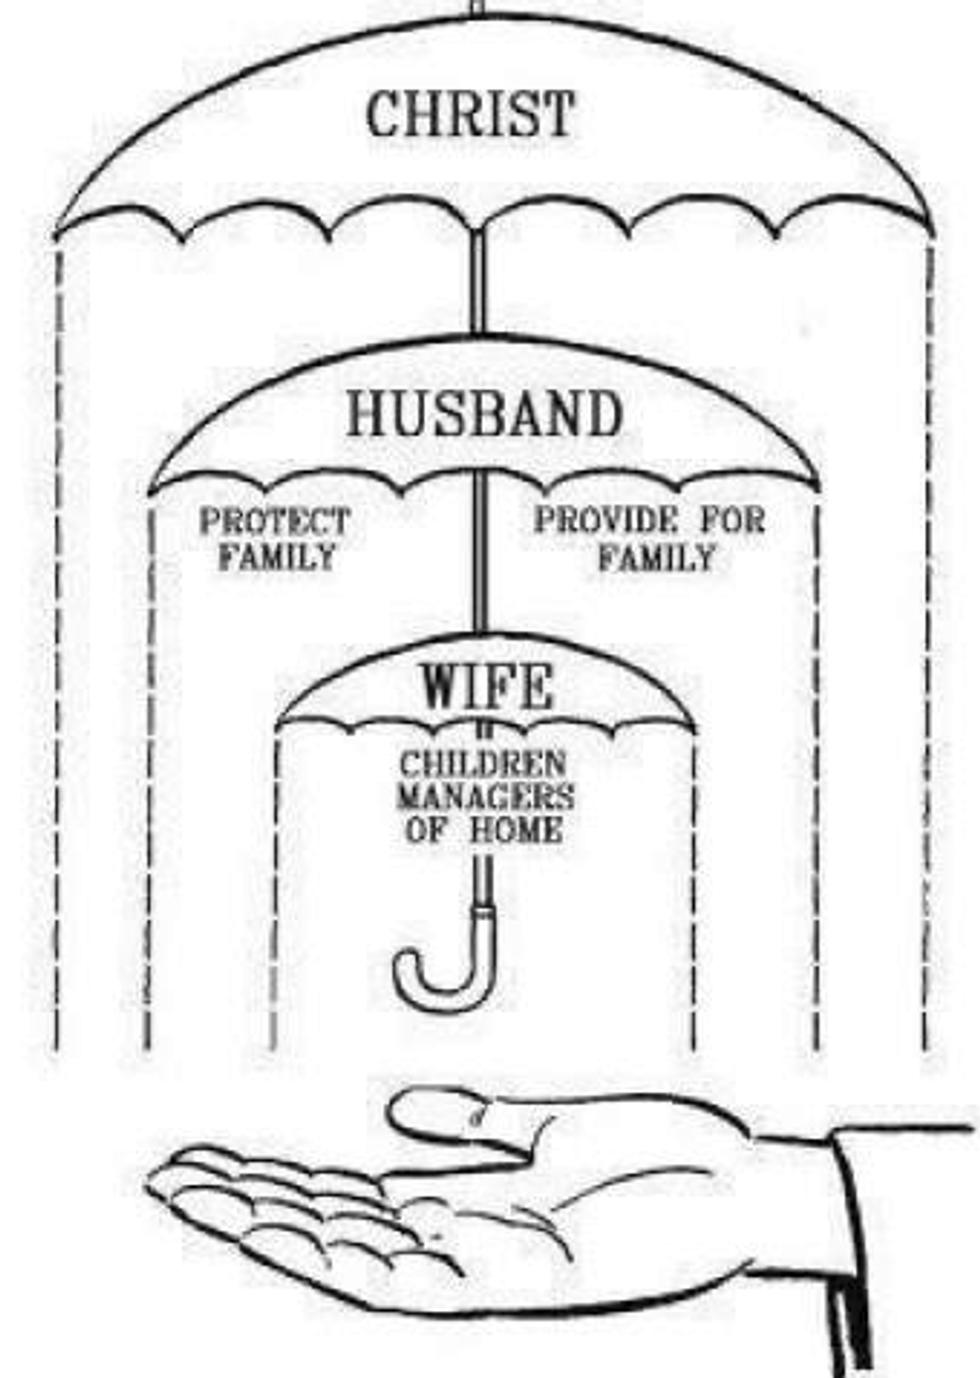 Umbrella of Protection